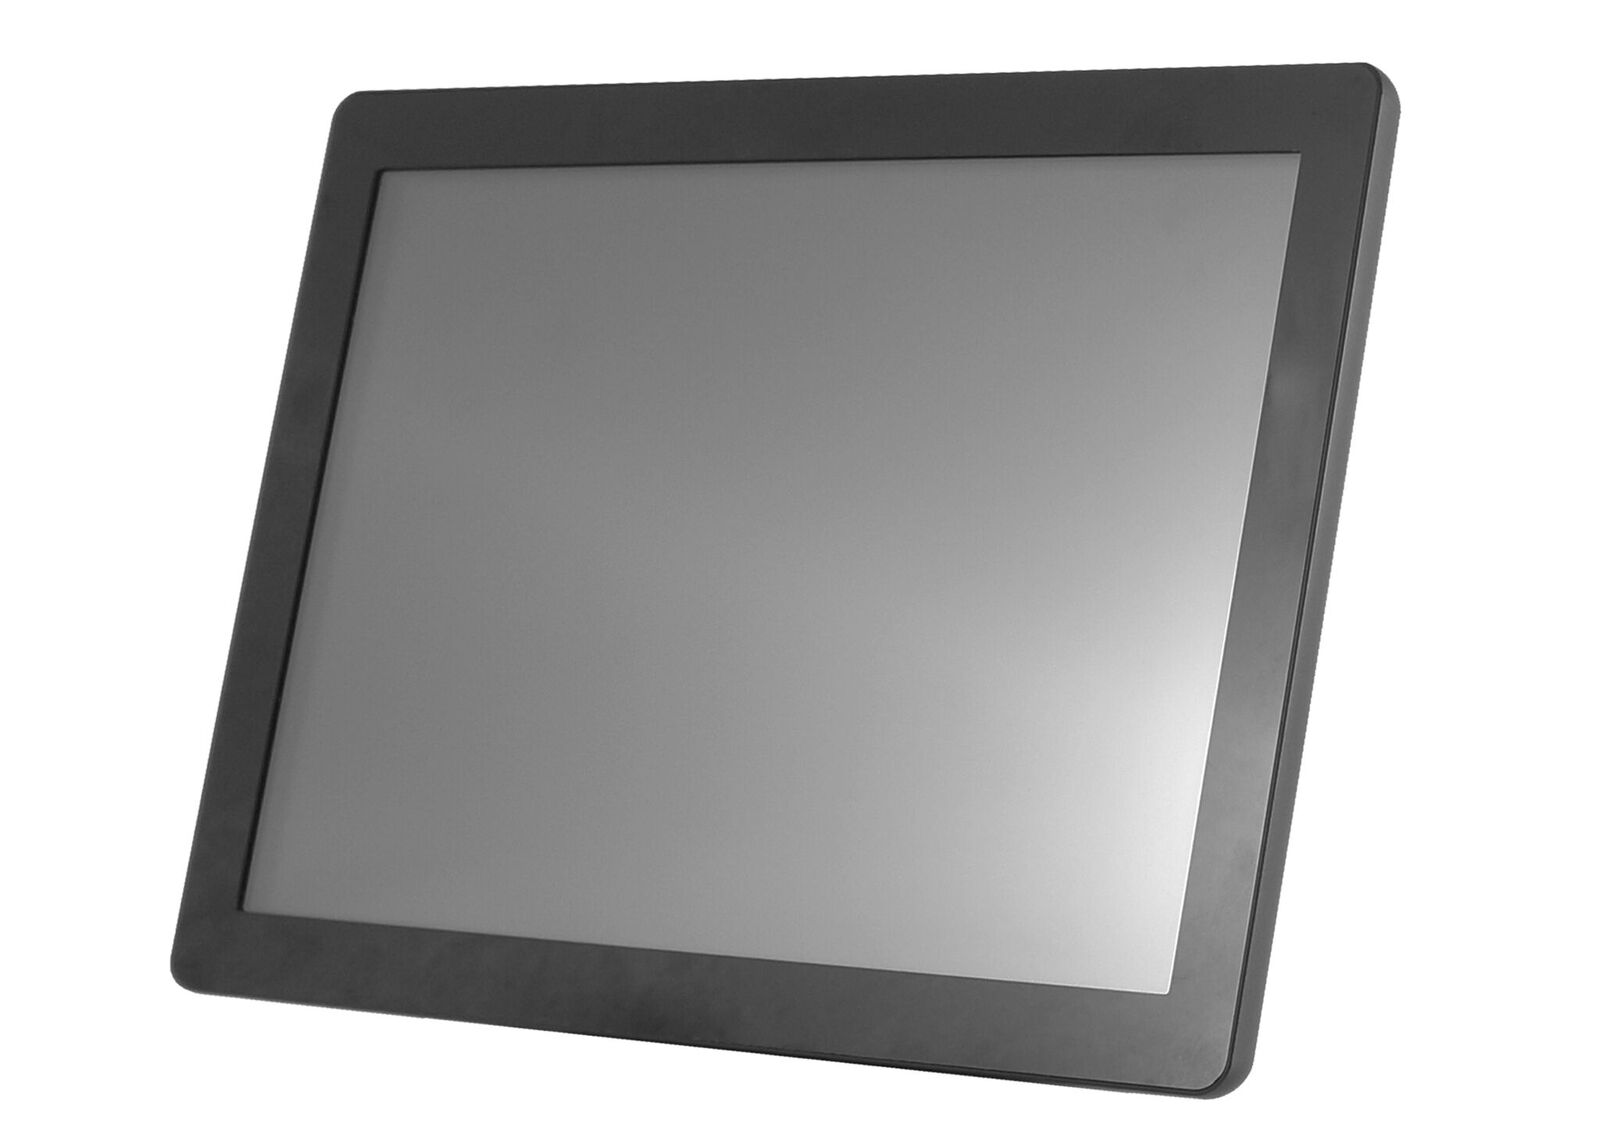 8'' Glass display - 800x600, 250nt, RES, USB